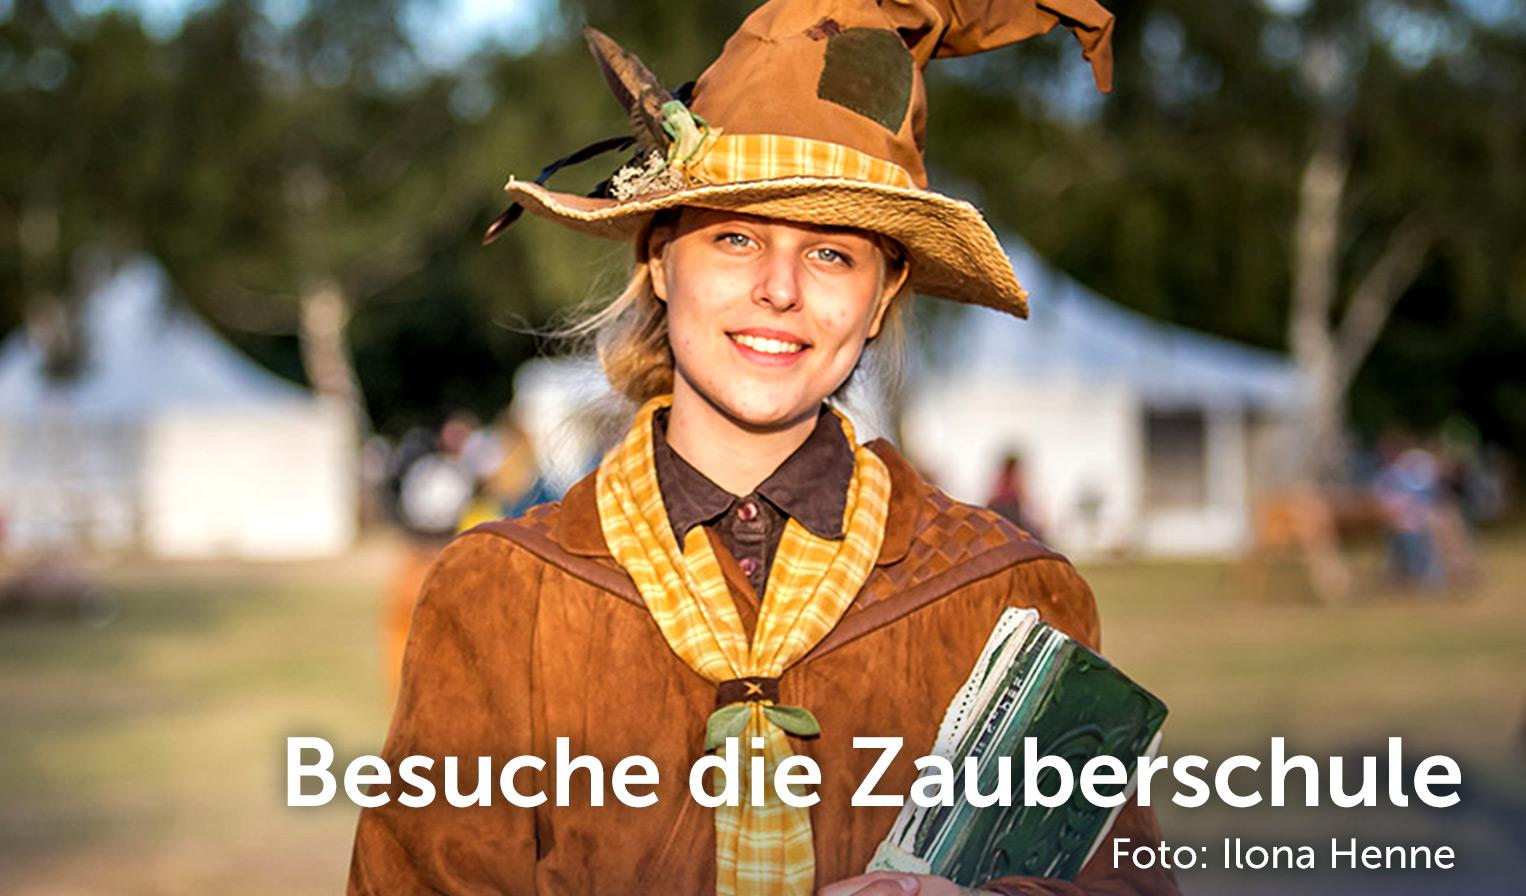 Ultimativer Zauberunterricht, Foto: Ilona Henne